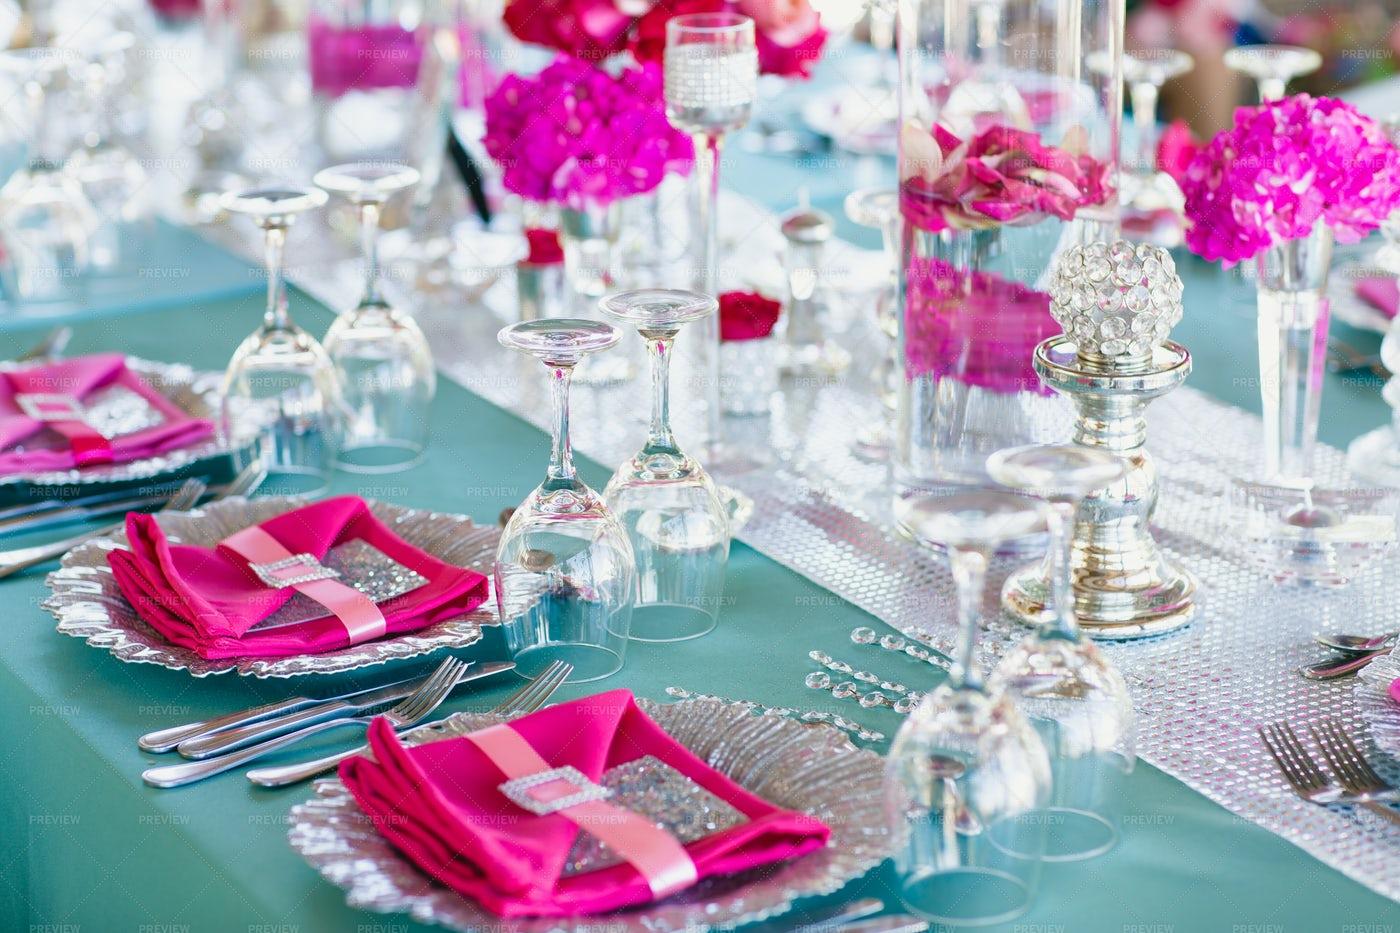 Wedding Table Decoration: Stock Photos